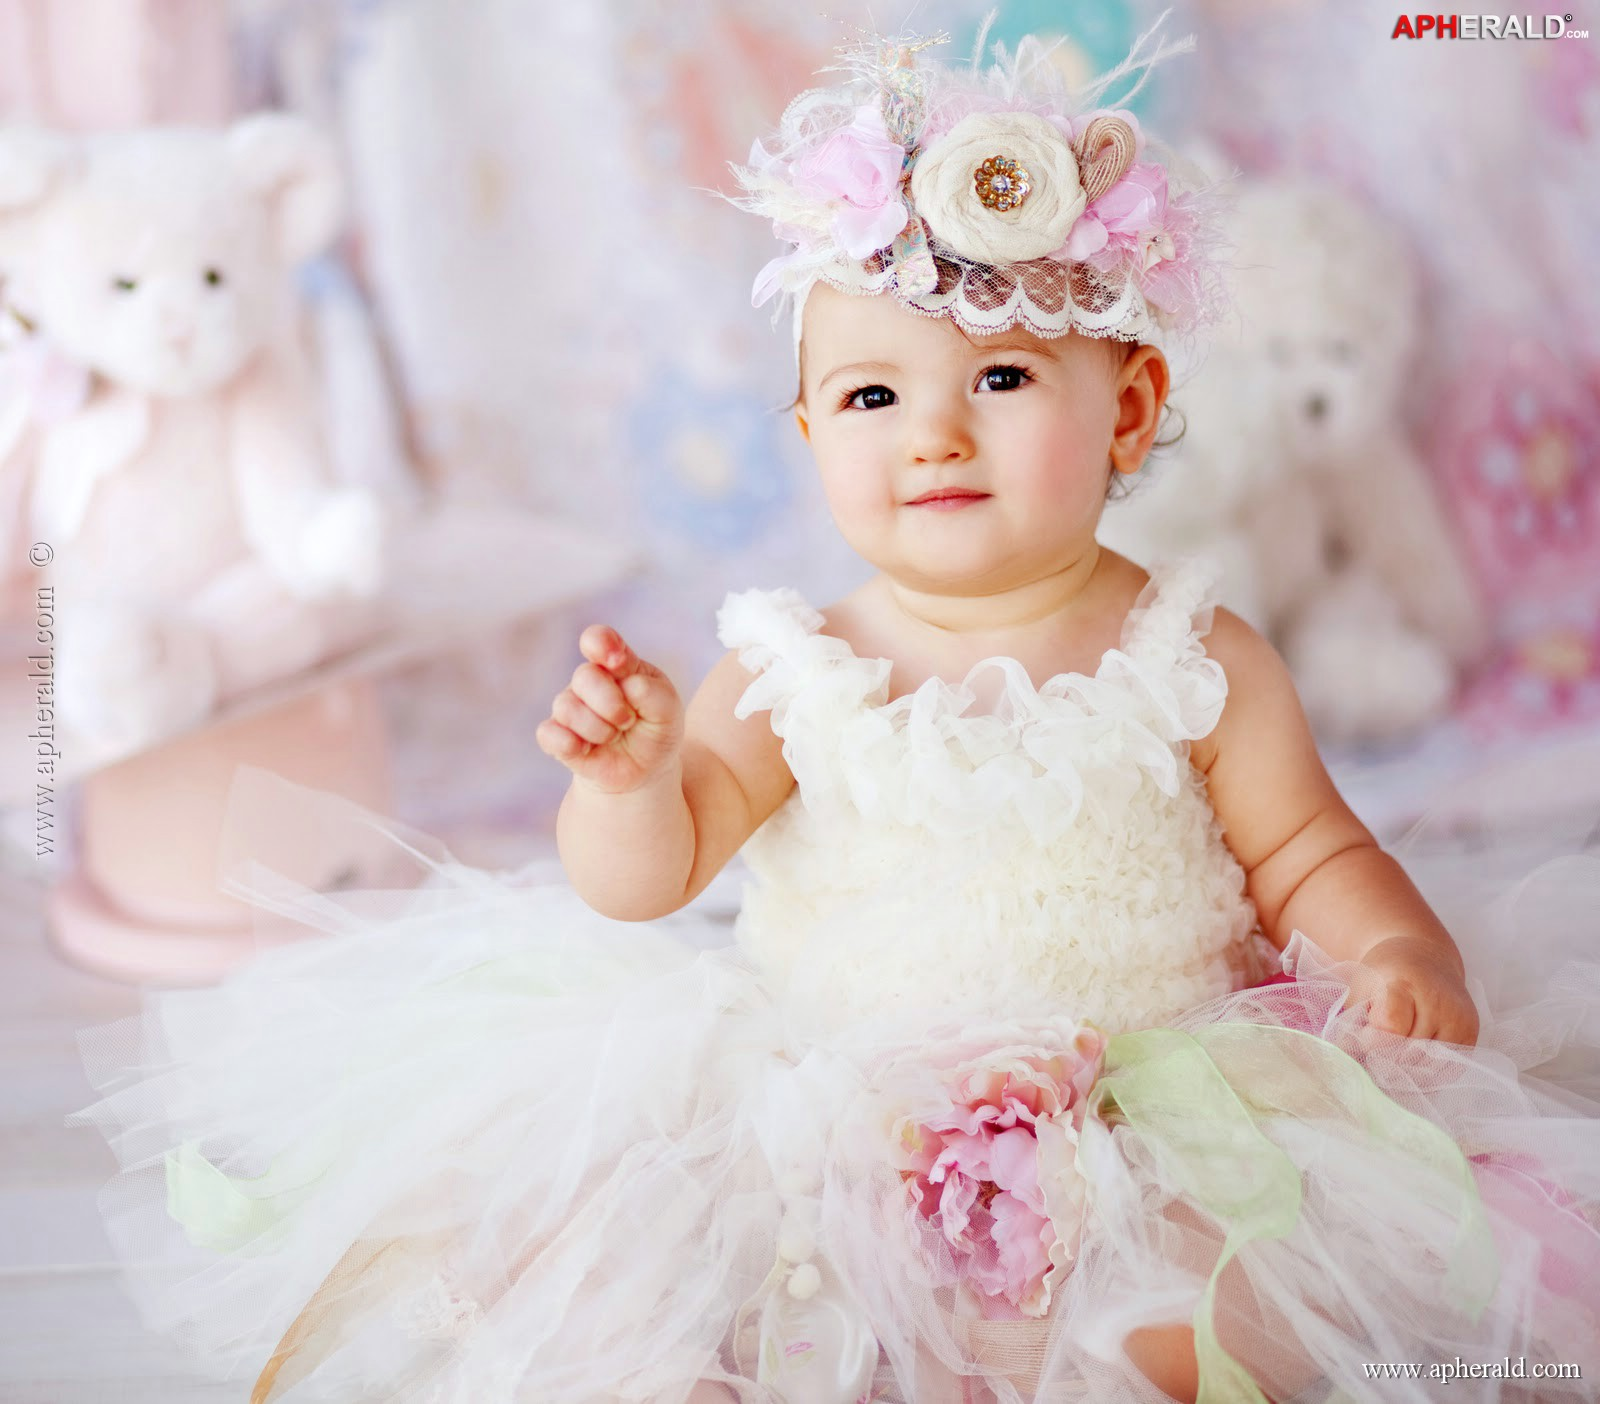 FunMozar Cute Baby Girl Wallpapers 1600x1404